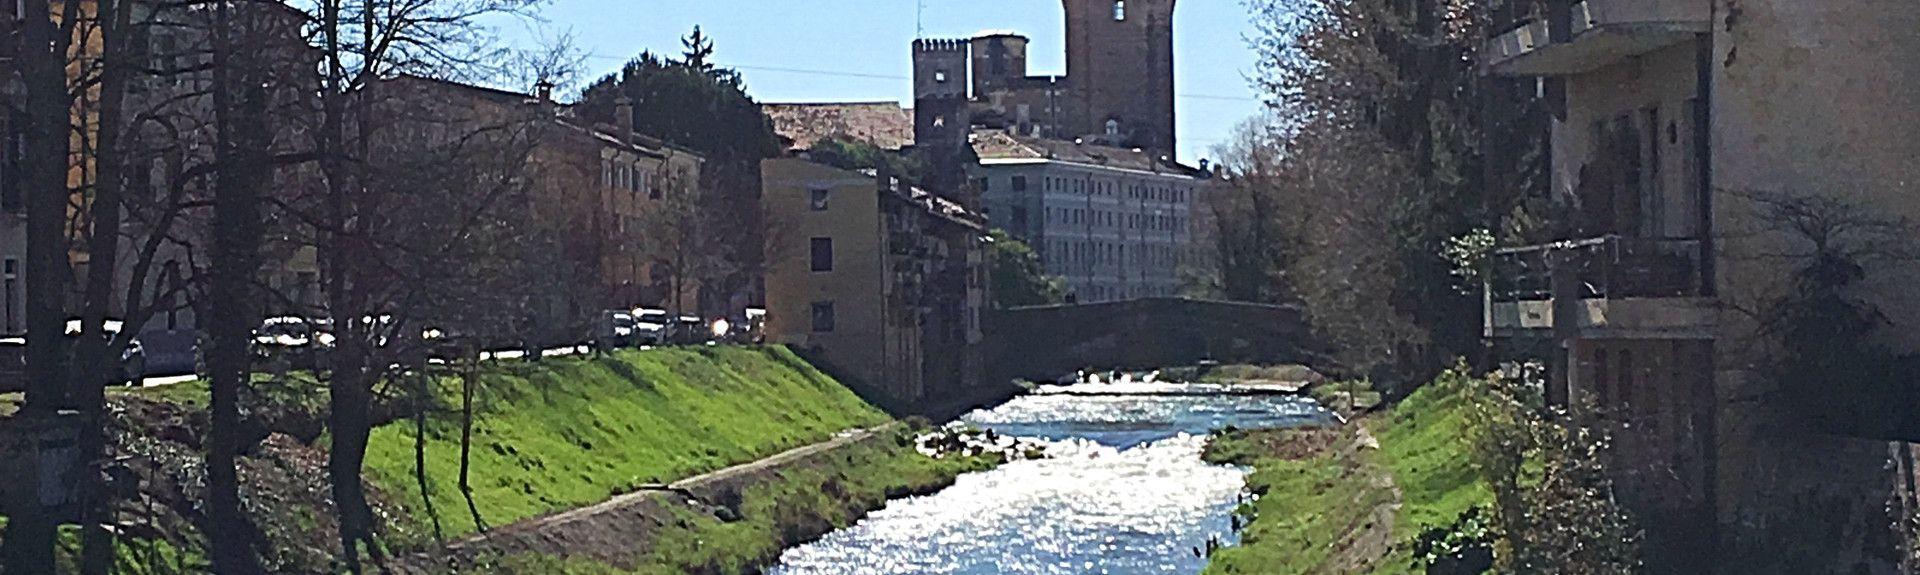 Galzignano Terme, Padua, Veneto, Italy